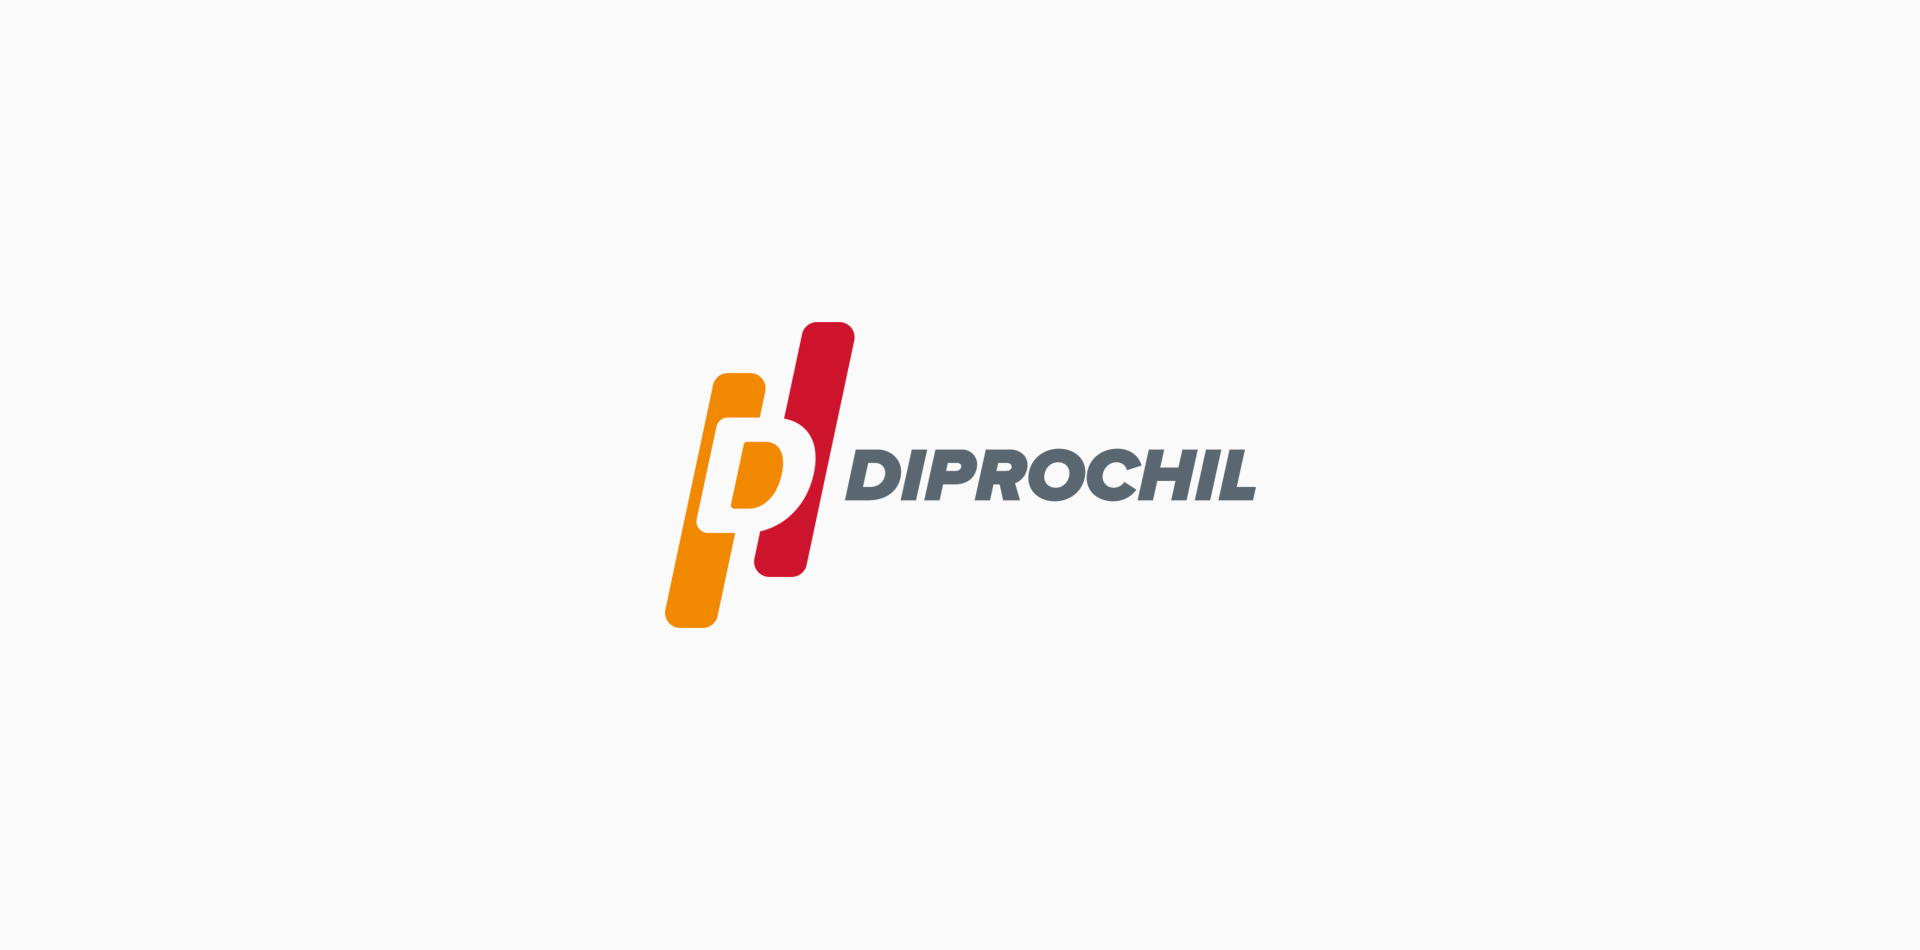 Diprochil